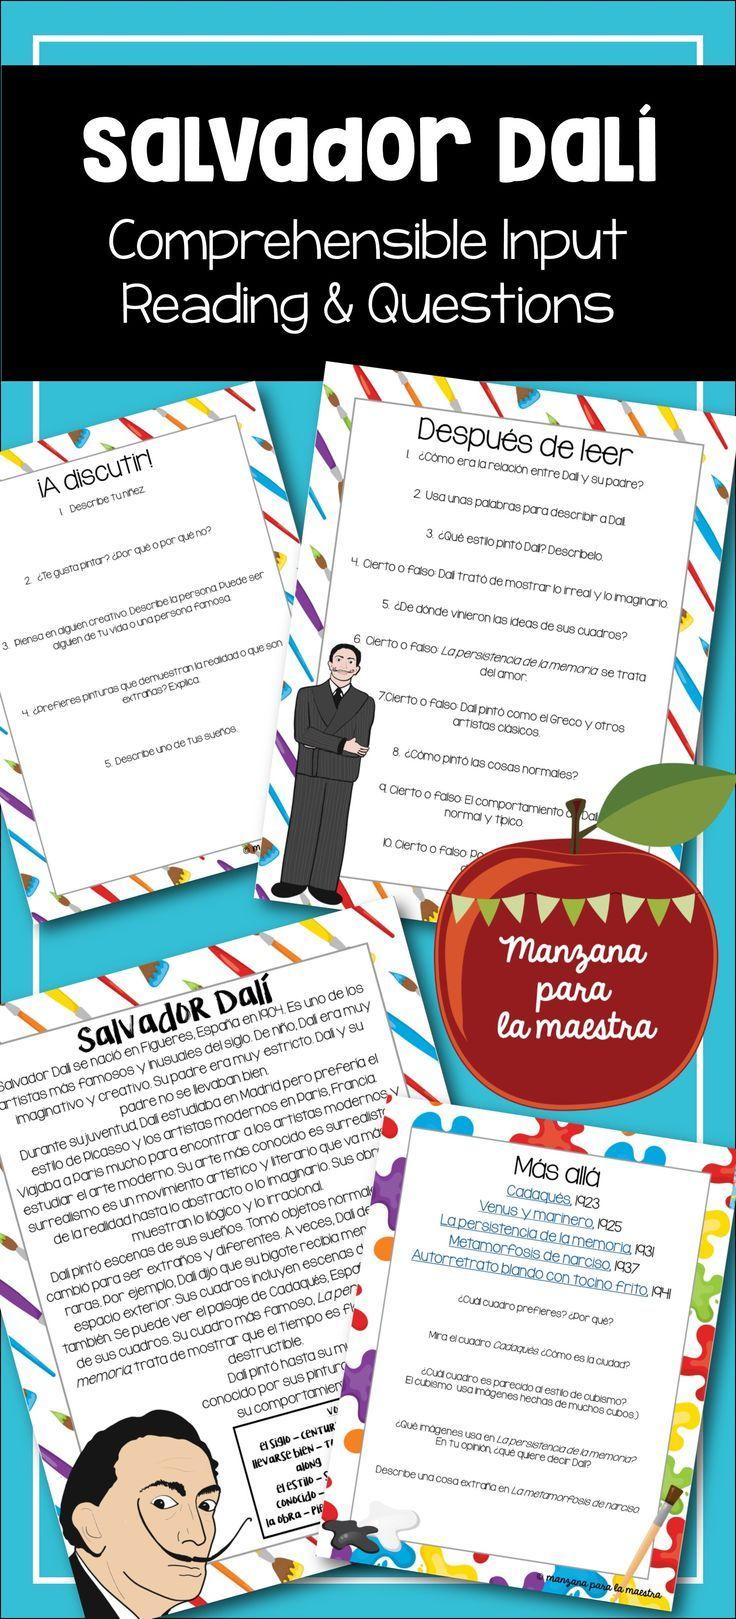 Salvador Dali Comprehensible Input Reading Comprehension ...